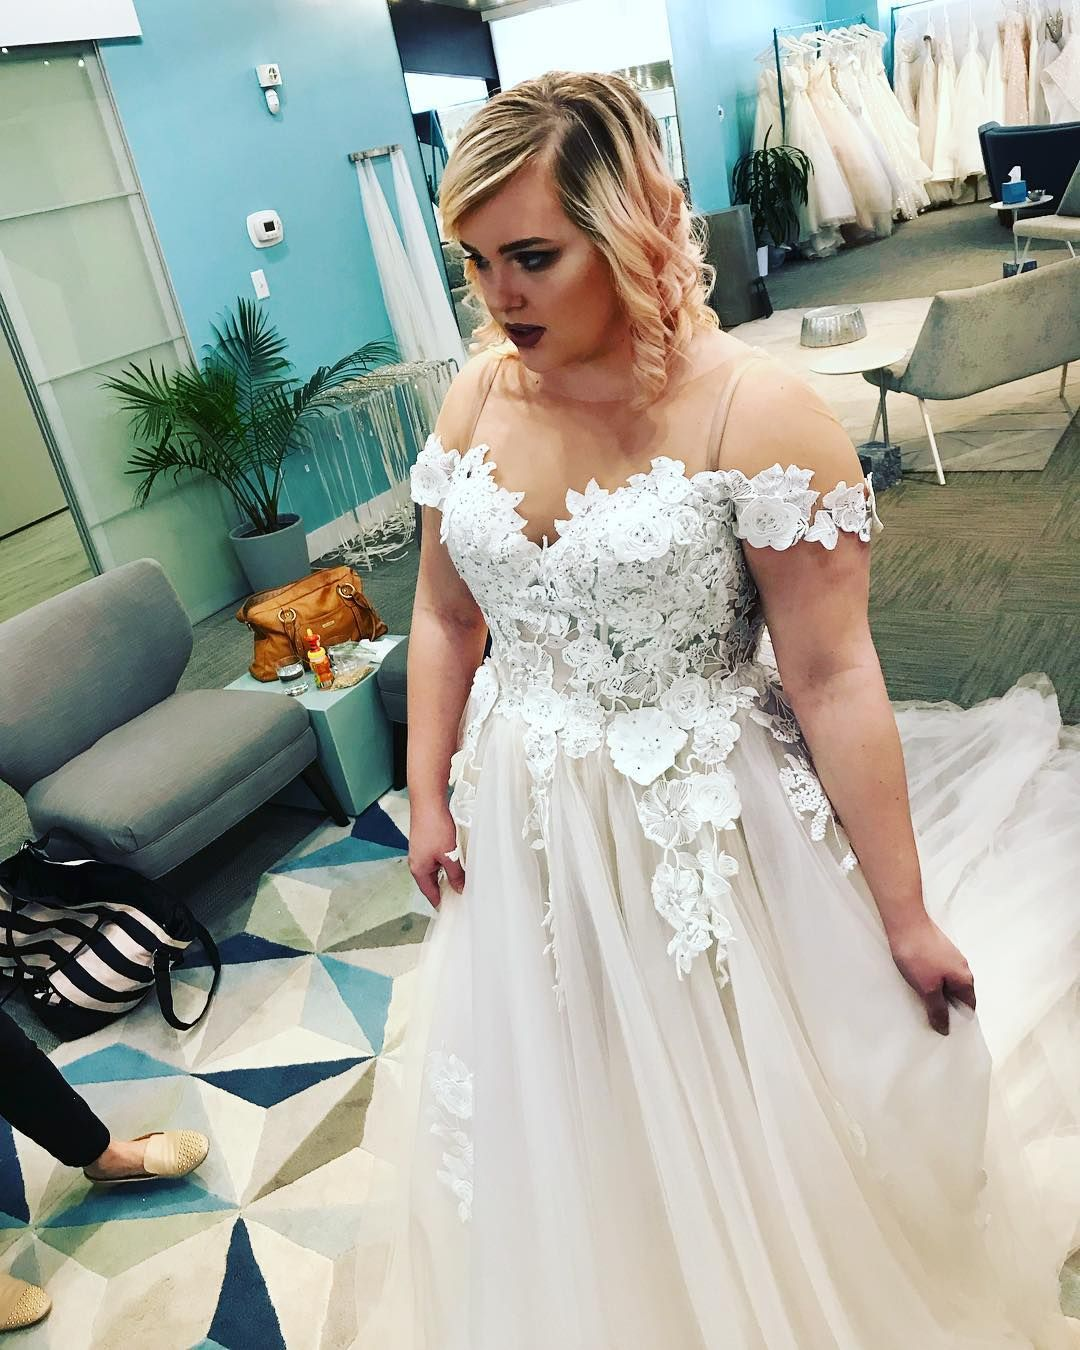 Custom plus size wedding gowns for fuller figured women by Darius ...